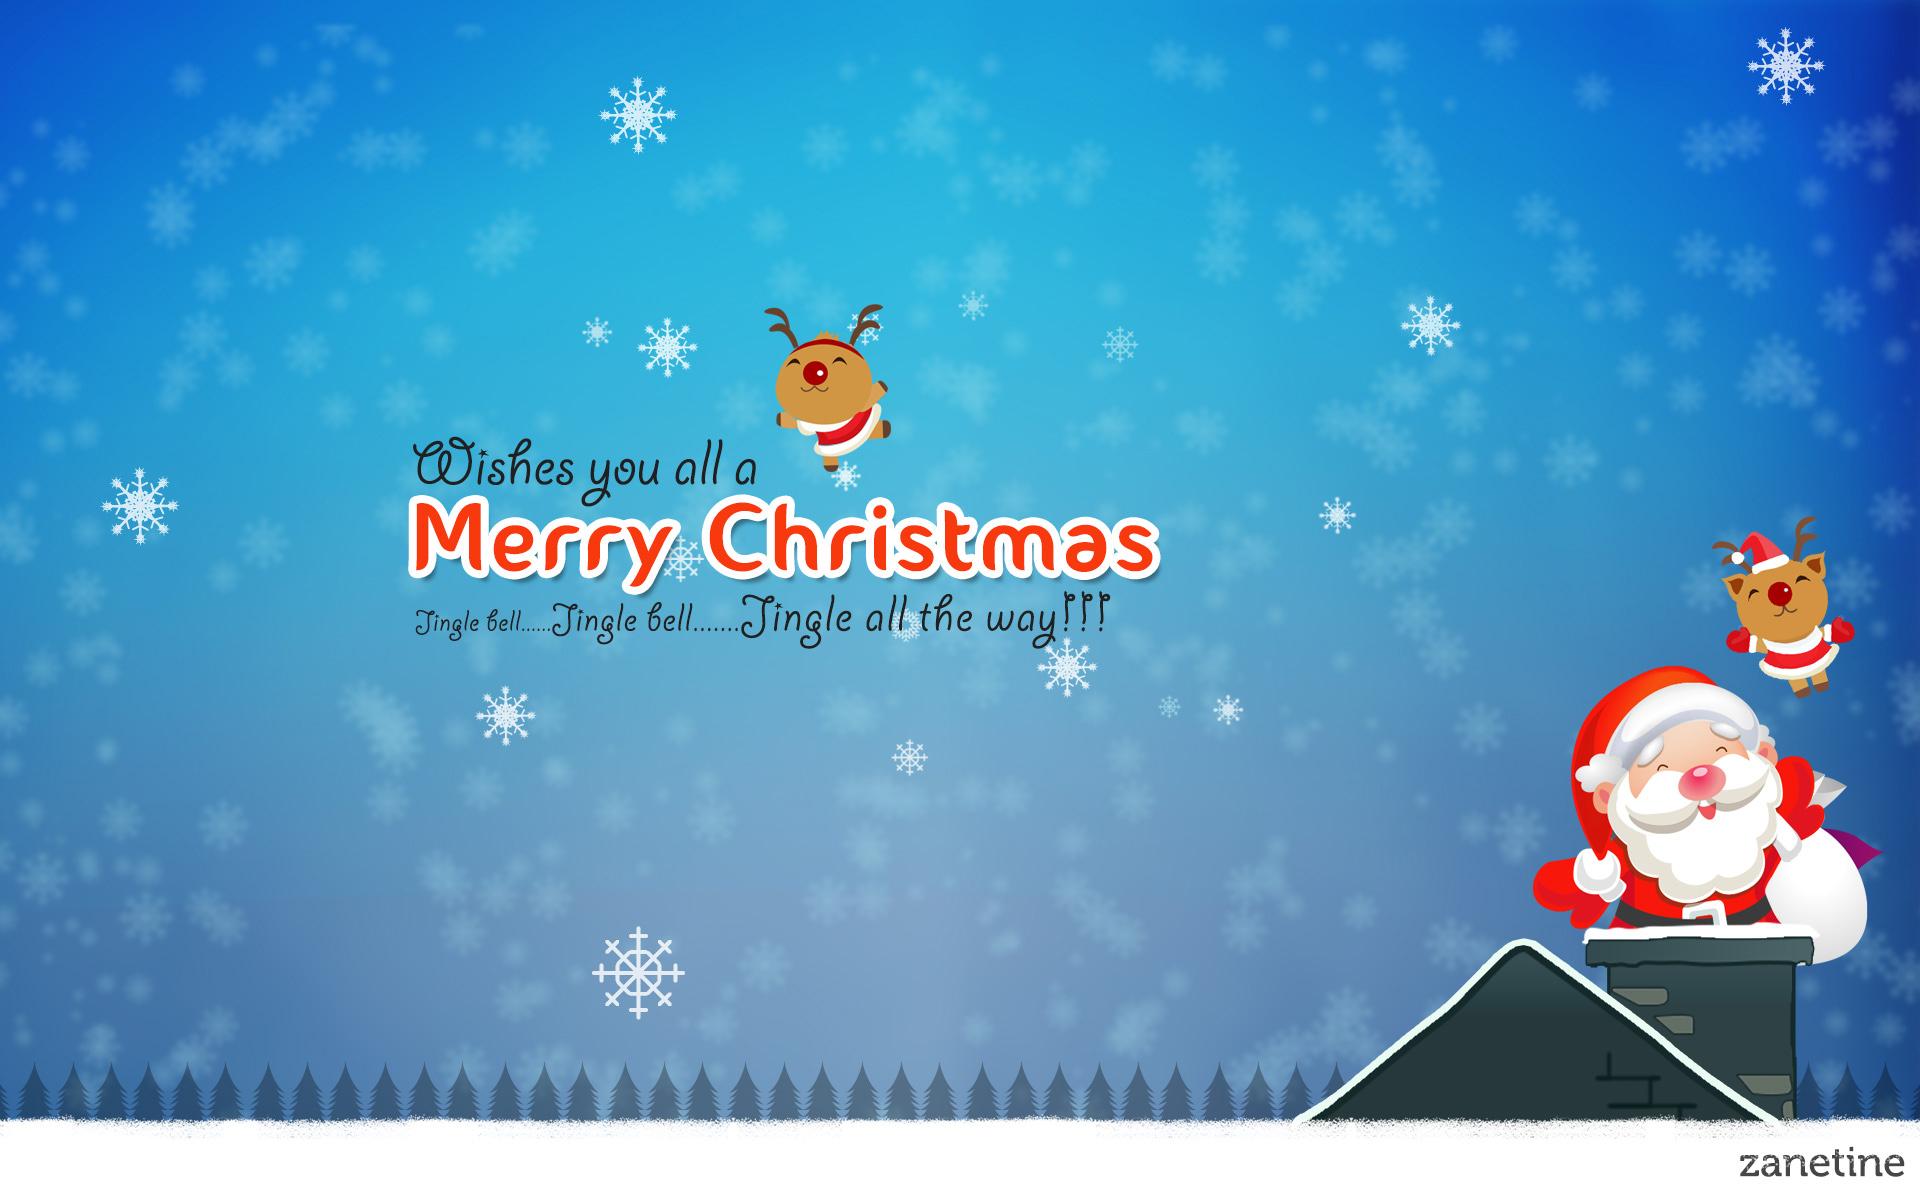 merry christmas jingle bells wallpapers | wallpapers hd